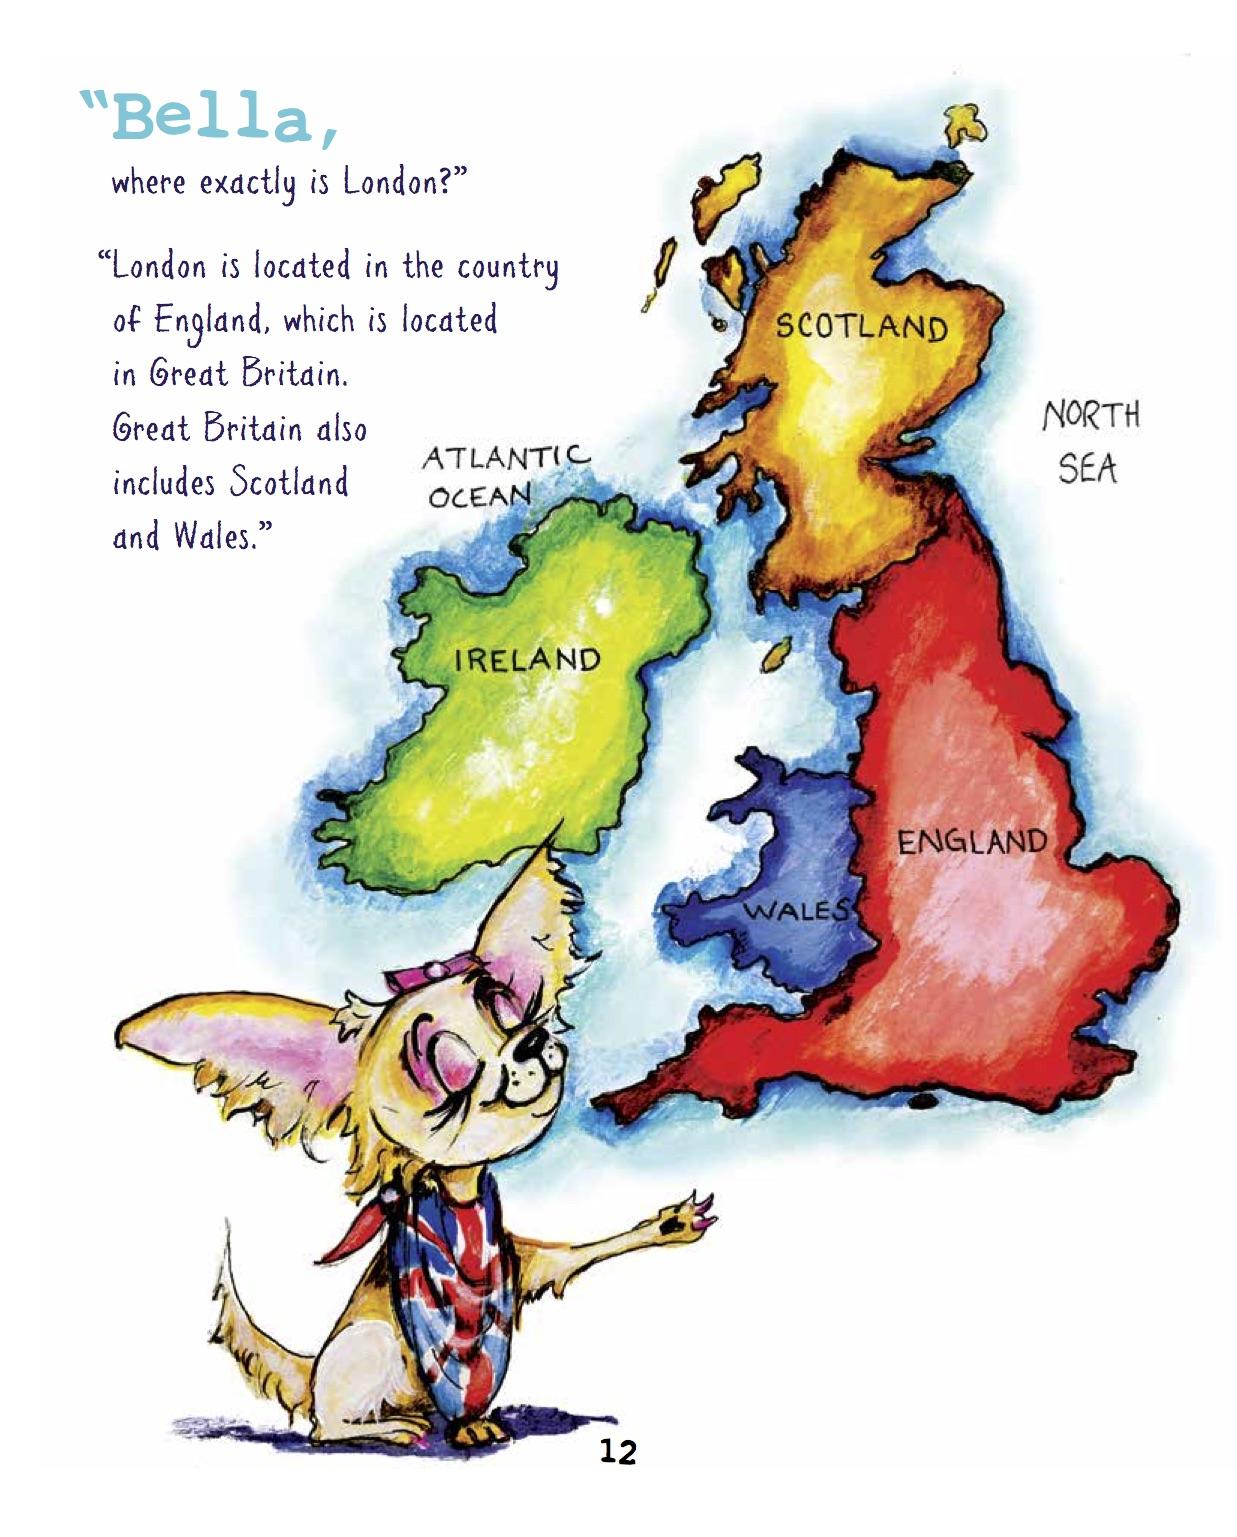 English adventures await